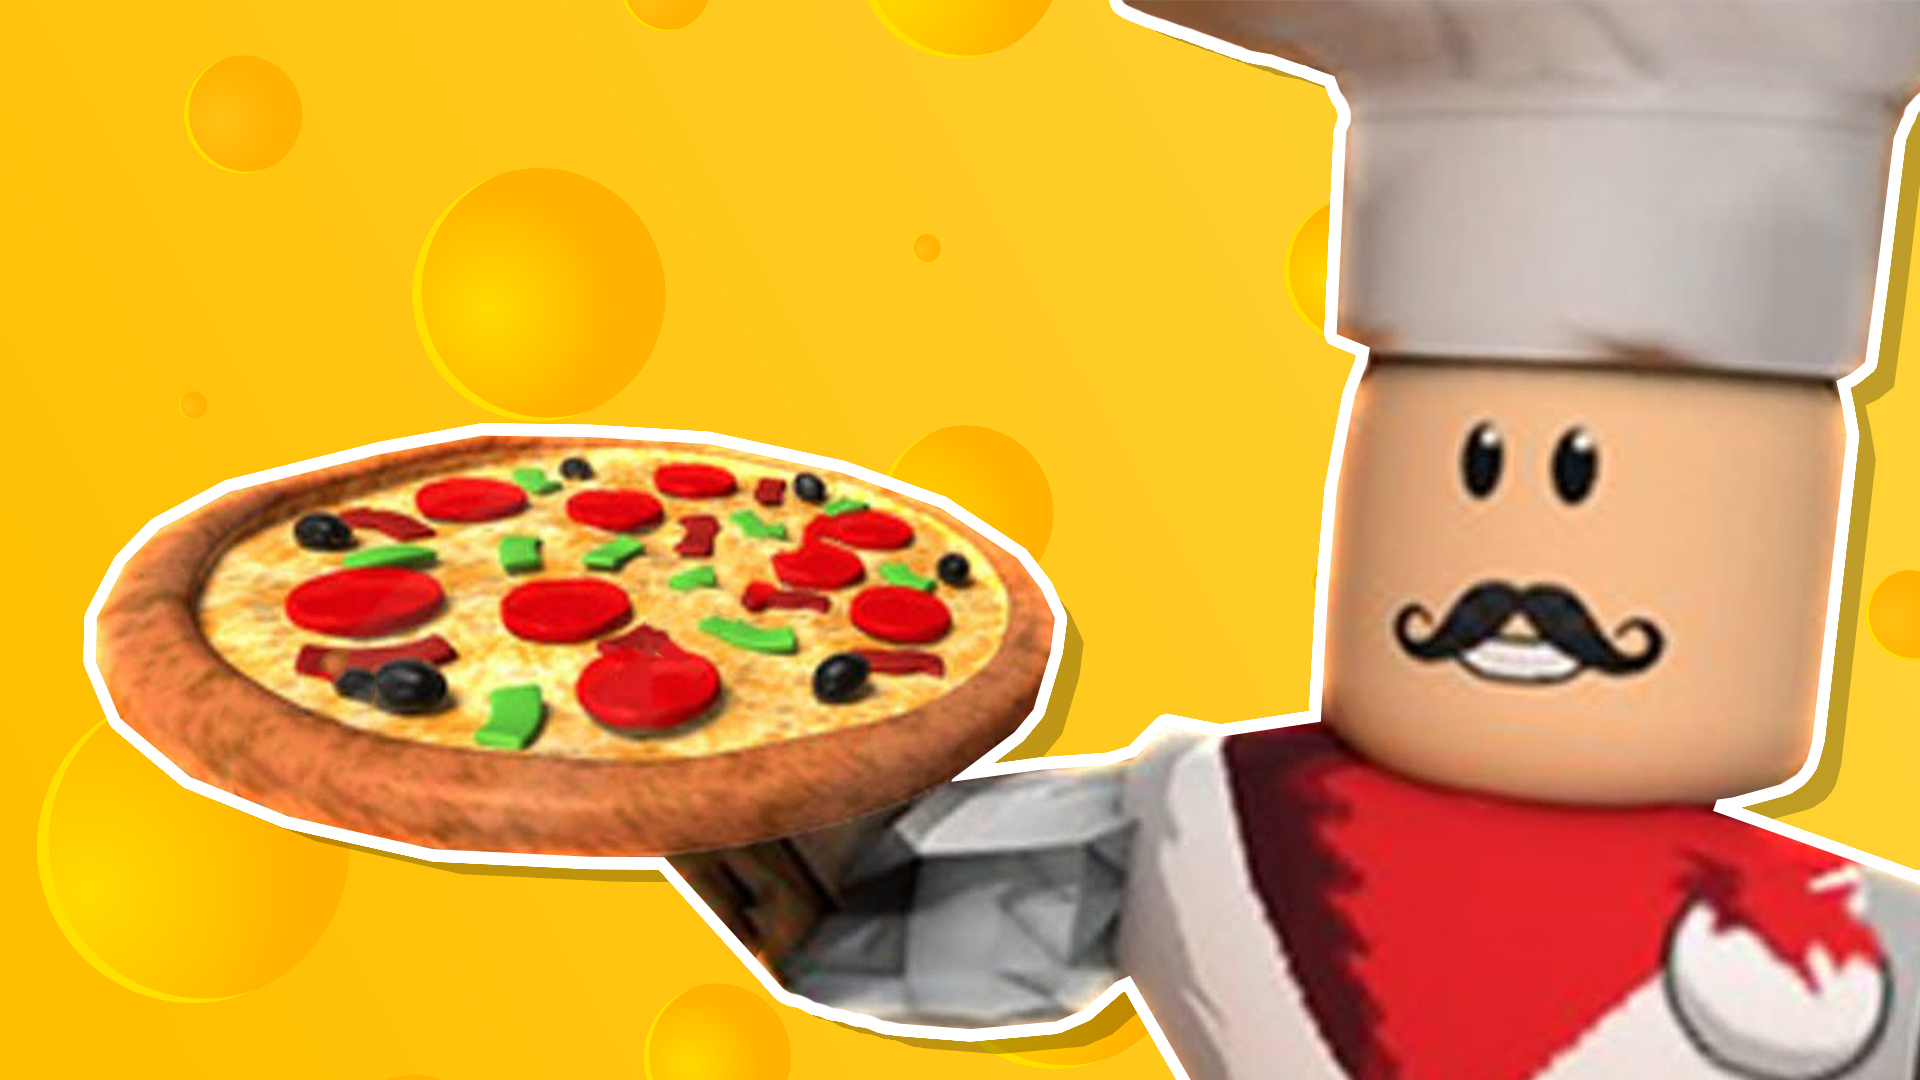 A pizza-themed joke